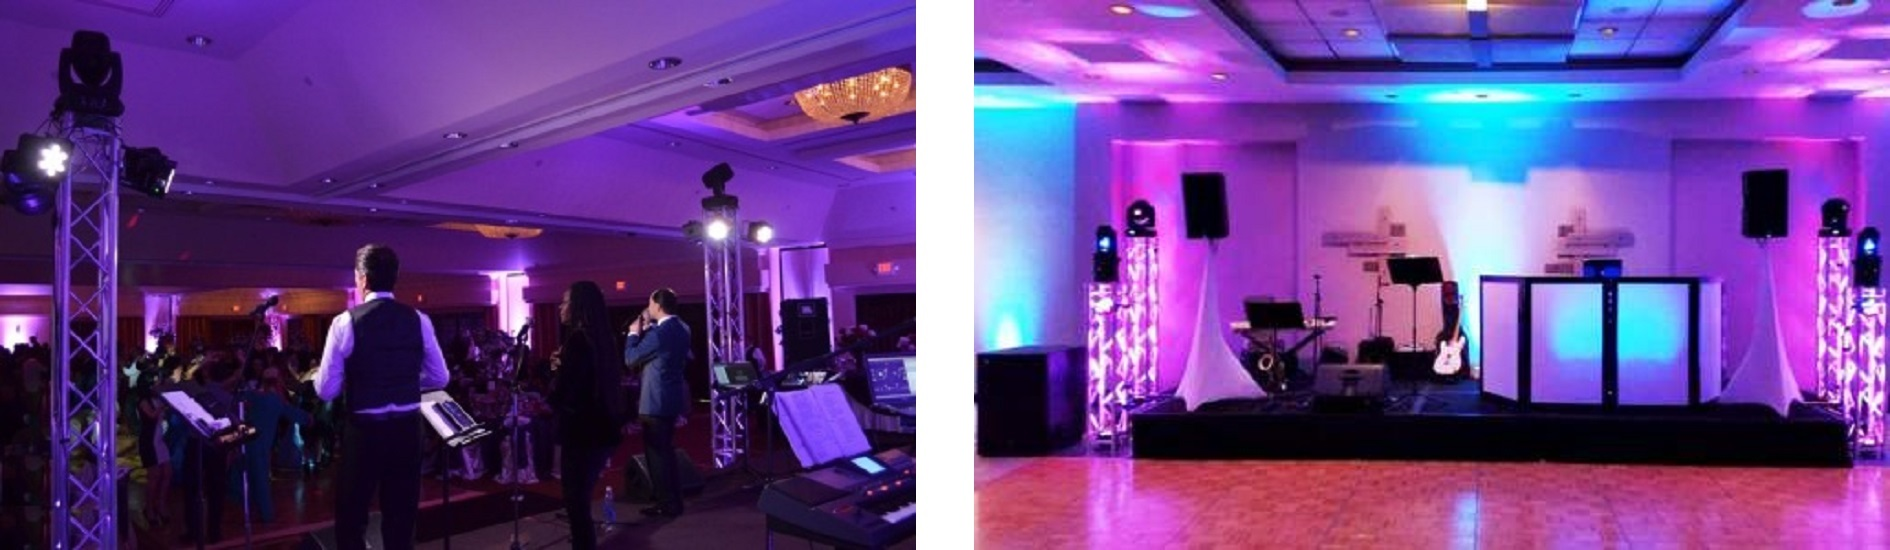 Houston Wedding DJ, DJs in Houston, Houston Stage Lighting Decor, Lighting Truss, Band Lighting, DMX, Spot Lighting, Flood Lighting, Moving Heads, Scanners for Houston Wedding, Event, Concert, Live Band, Awesome Lighting Decor, Awesome Music Entertainment, Awesome Event Pros, AME DJs, Sonido DJ Sammy De Houston